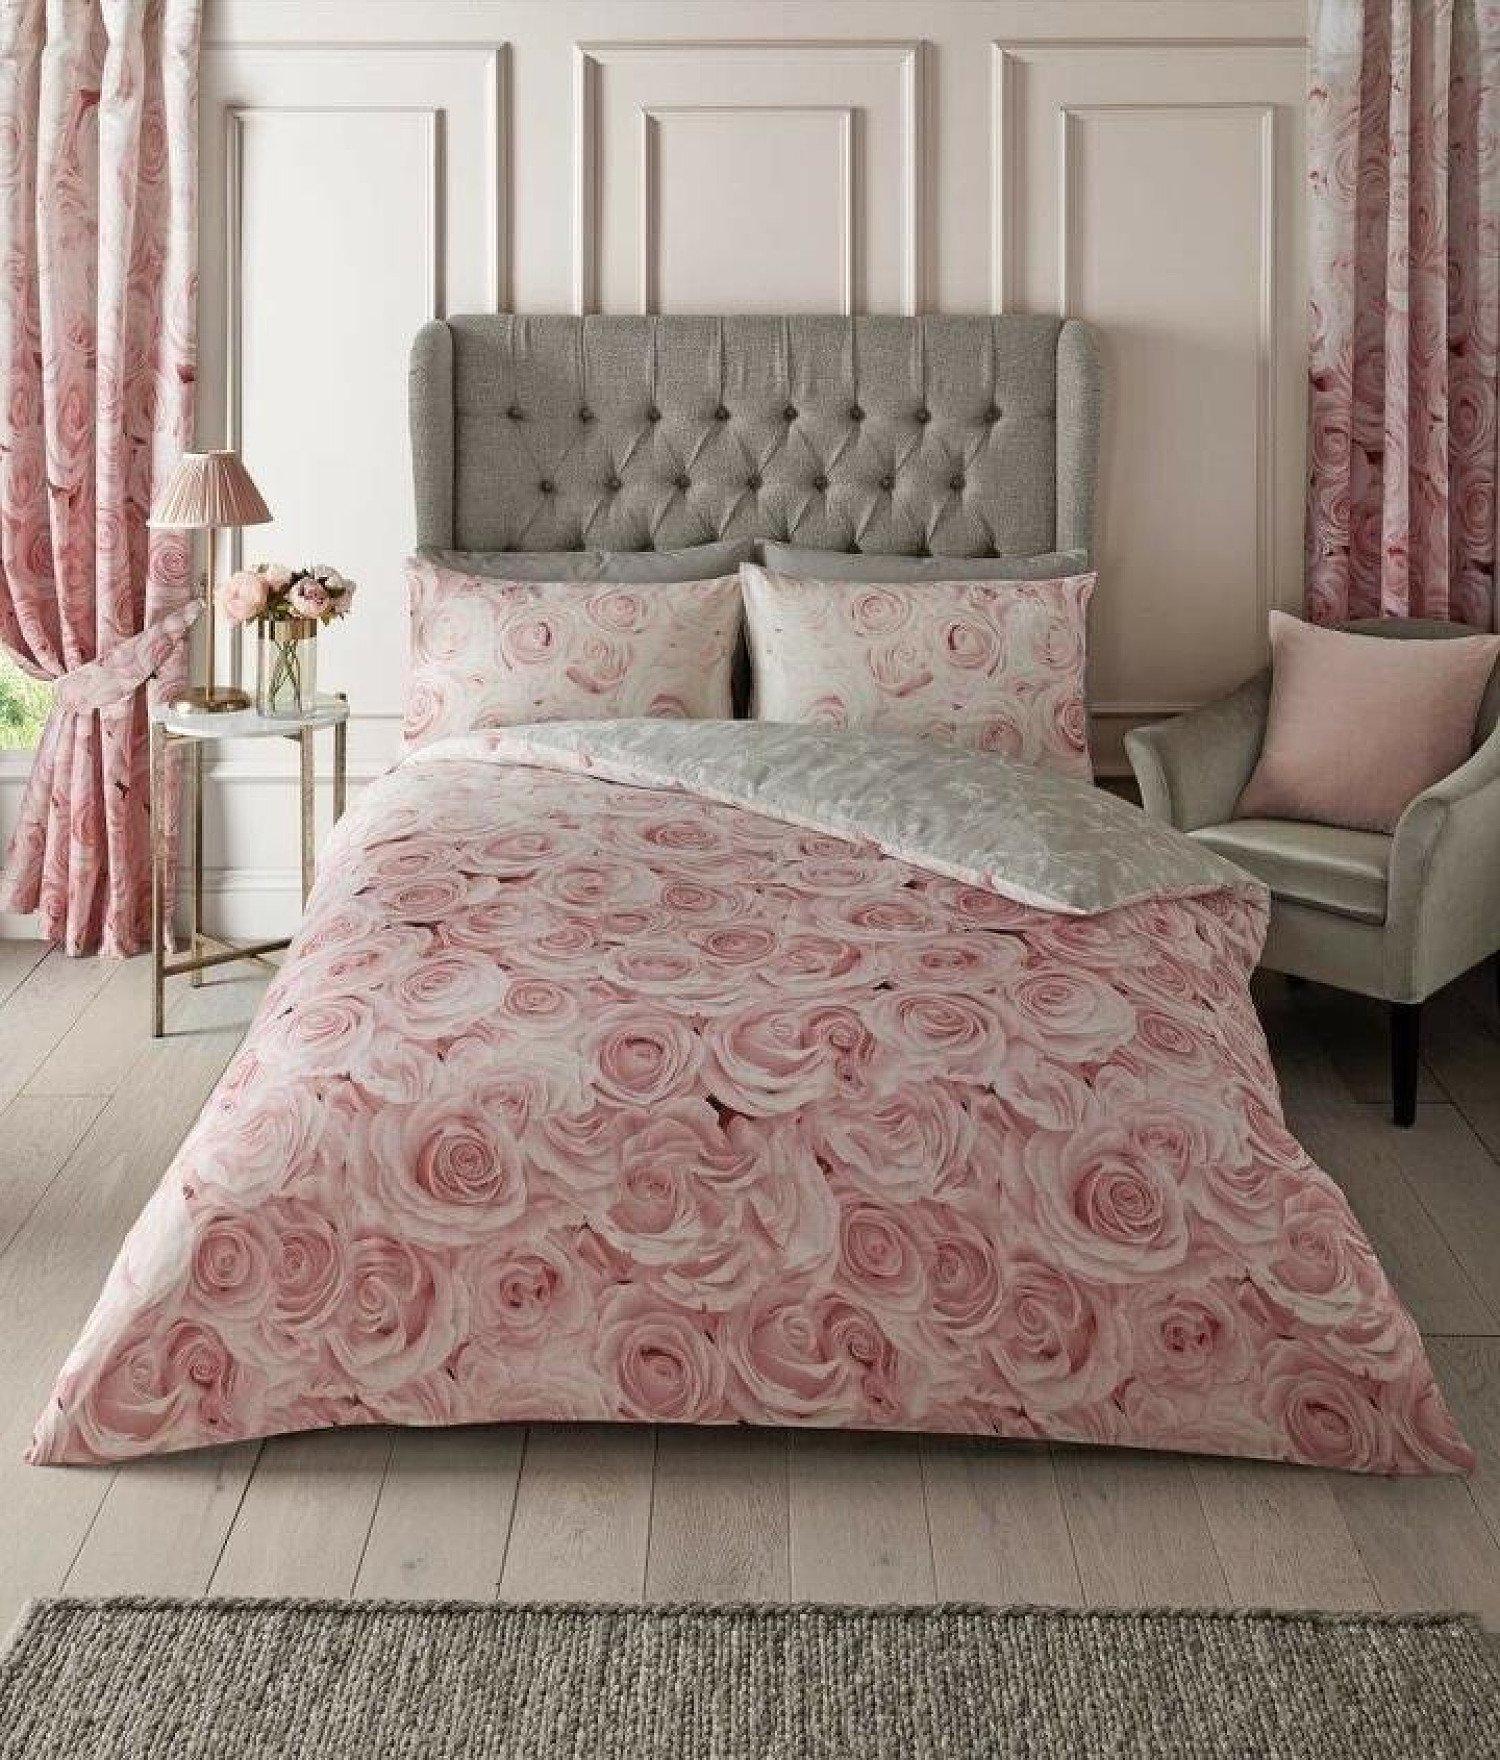 Blush Pink Rose Flower Duvet Set Reversible Grey Quilt Cover Free Postage